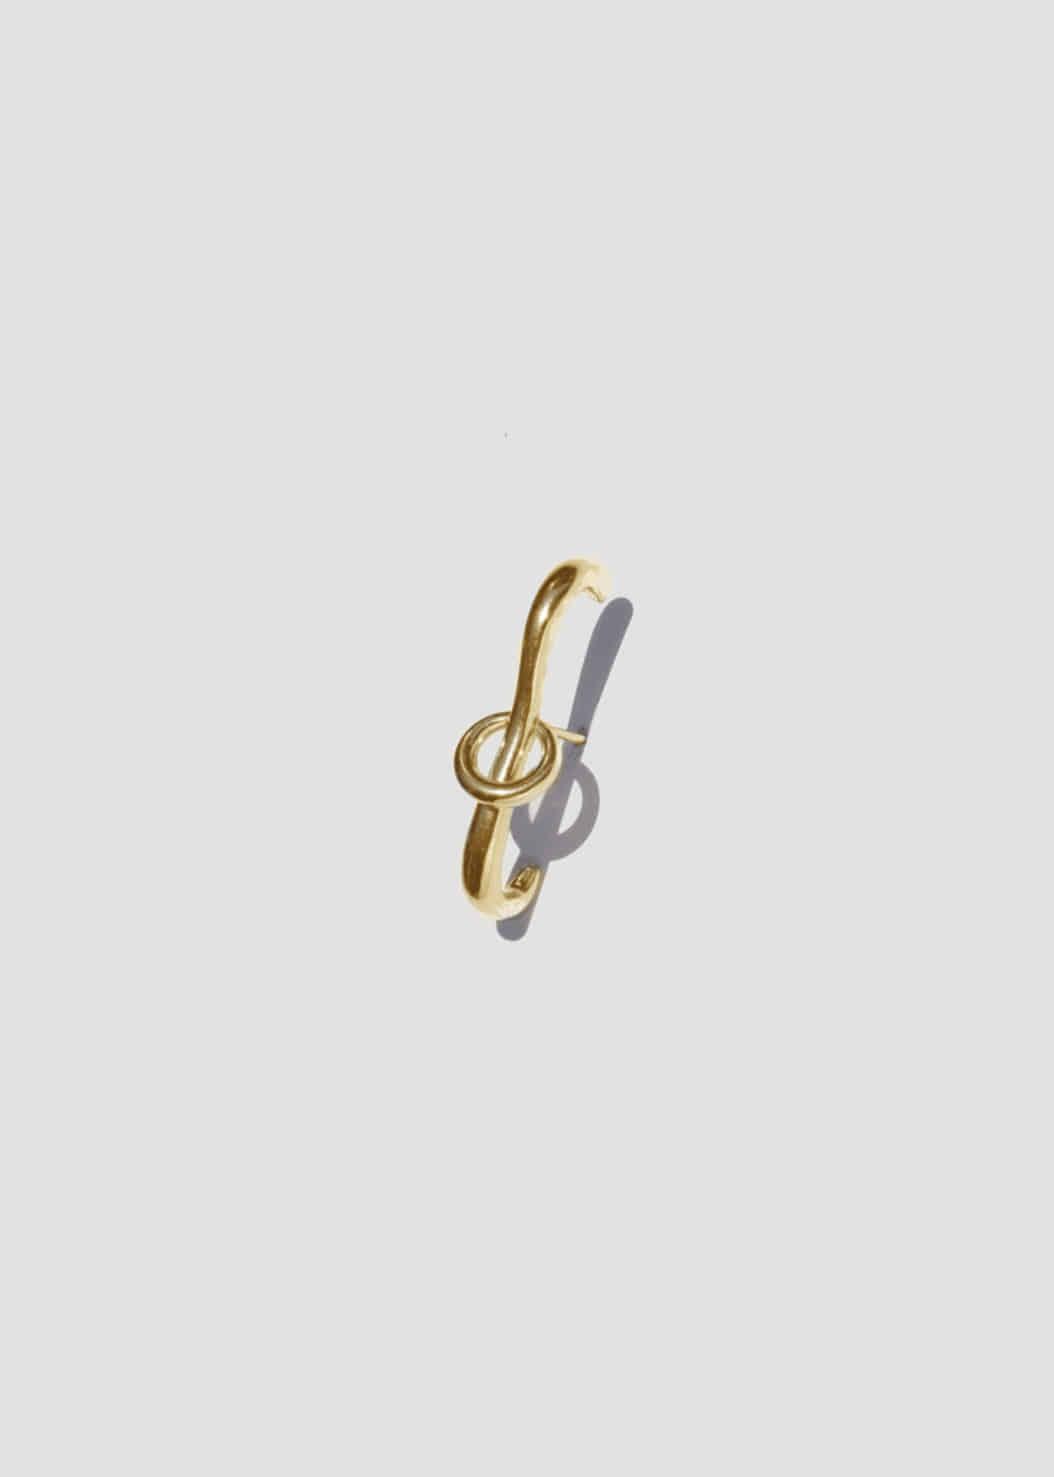 LINK LINK EARRING - GOLD VERMEIL